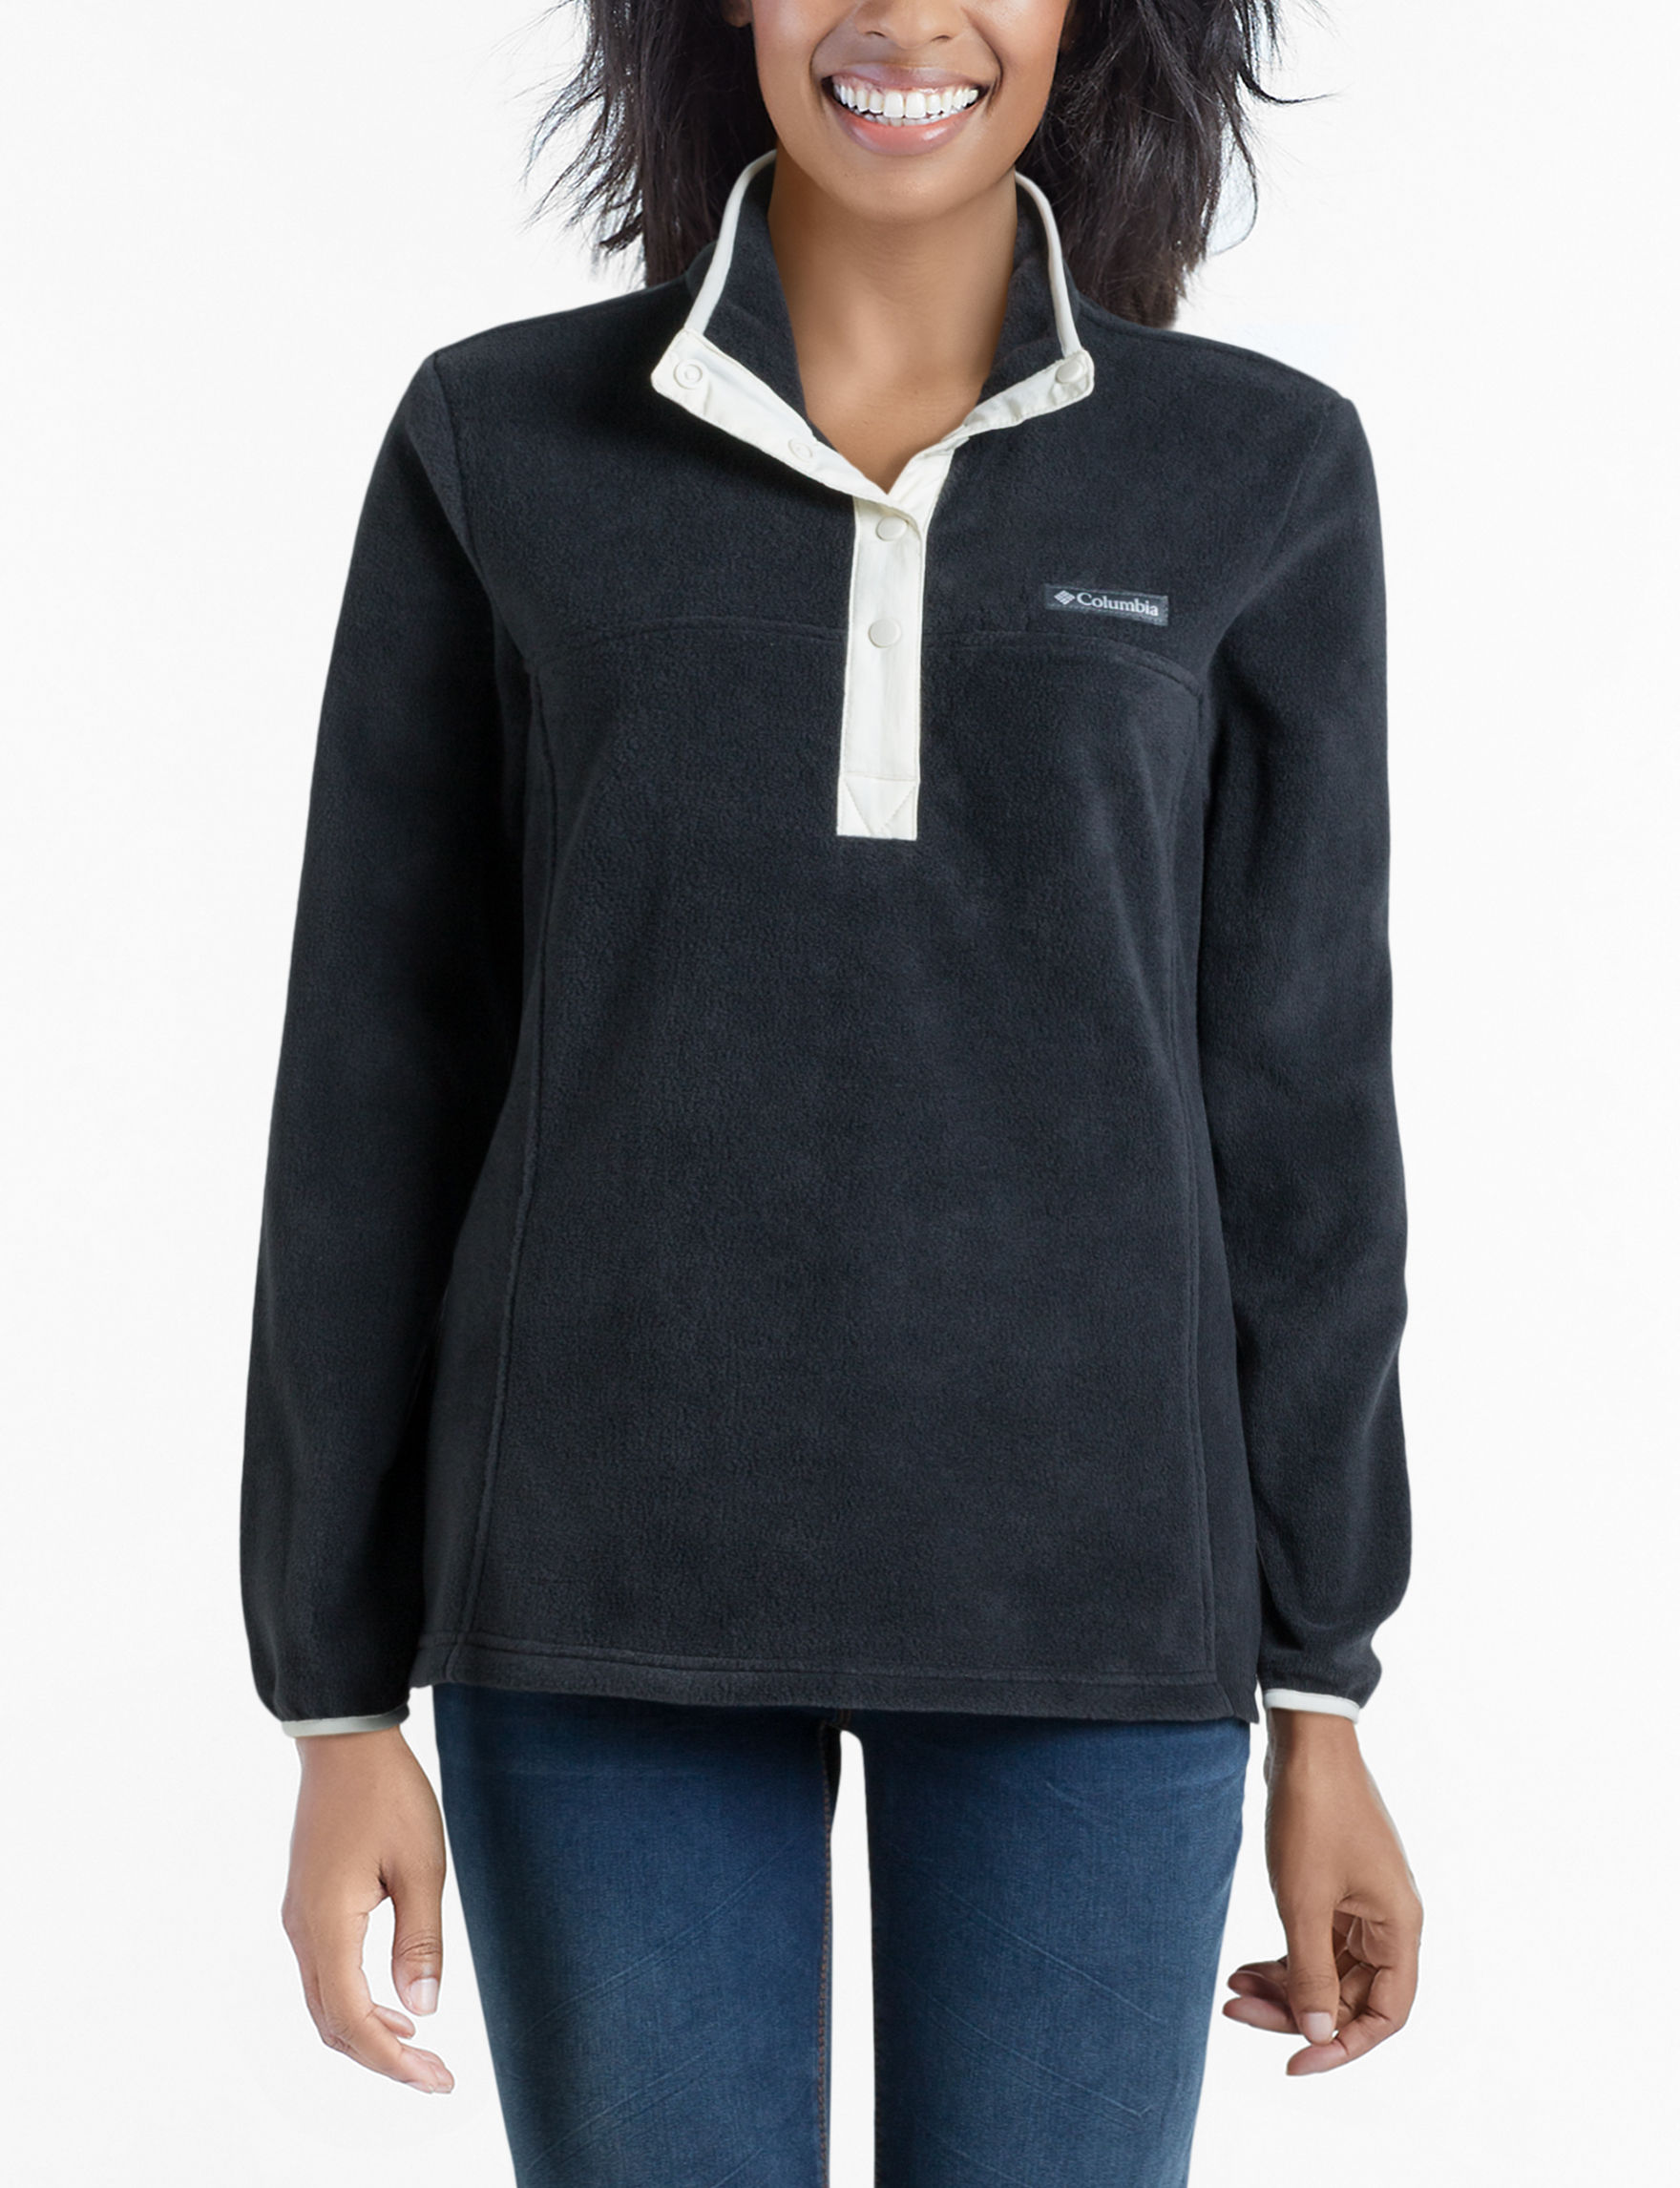 Columbia Black Fleece & Soft Shell Jackets Lightweight Jackets & Blazers